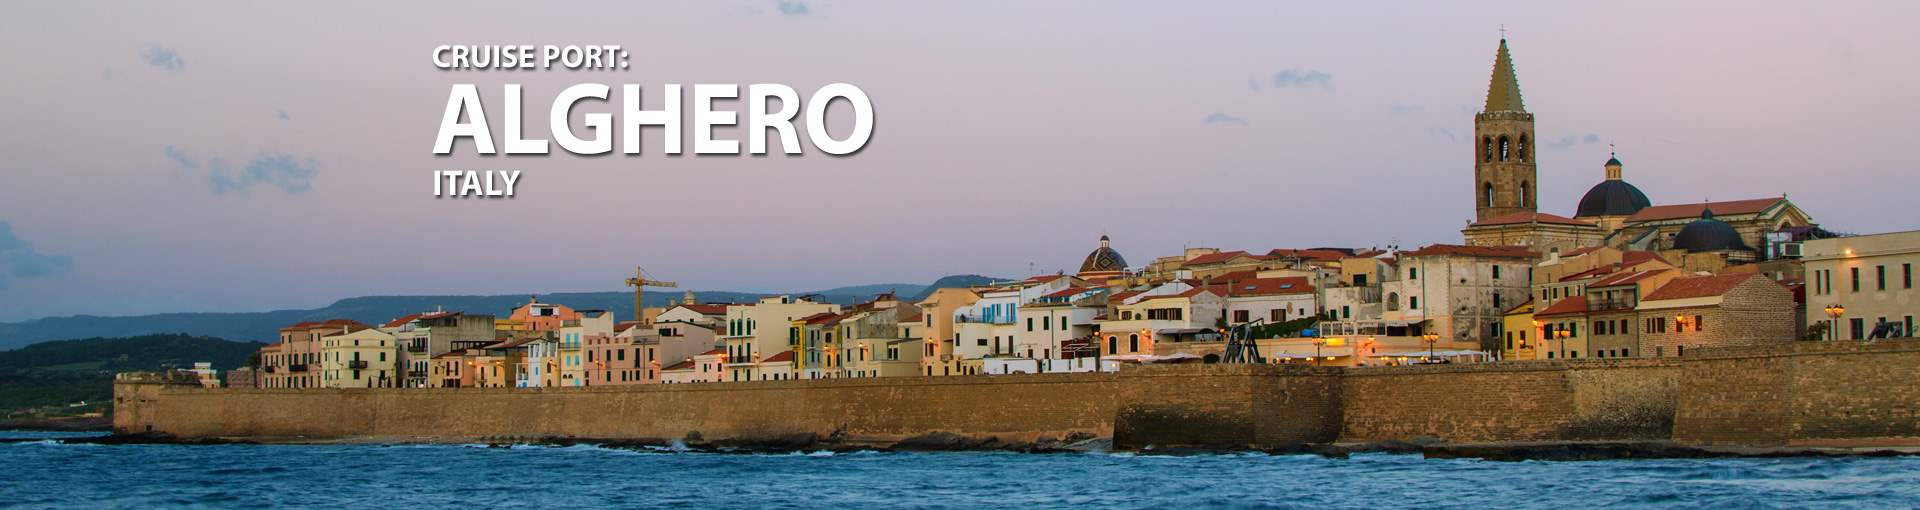 Cruises to Alghero, Italy